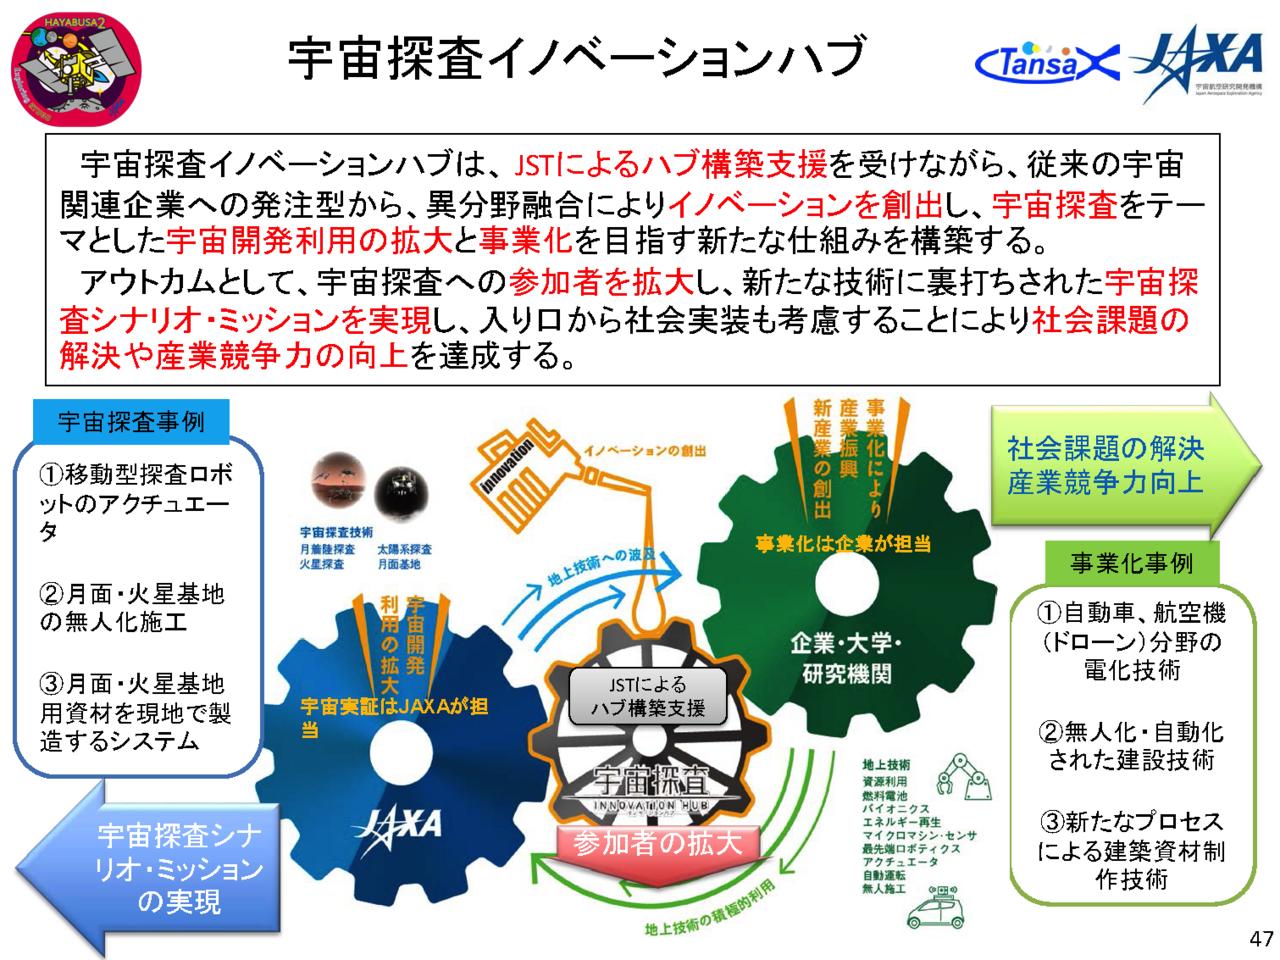 f:id:Imamura:20180802150007p:plain